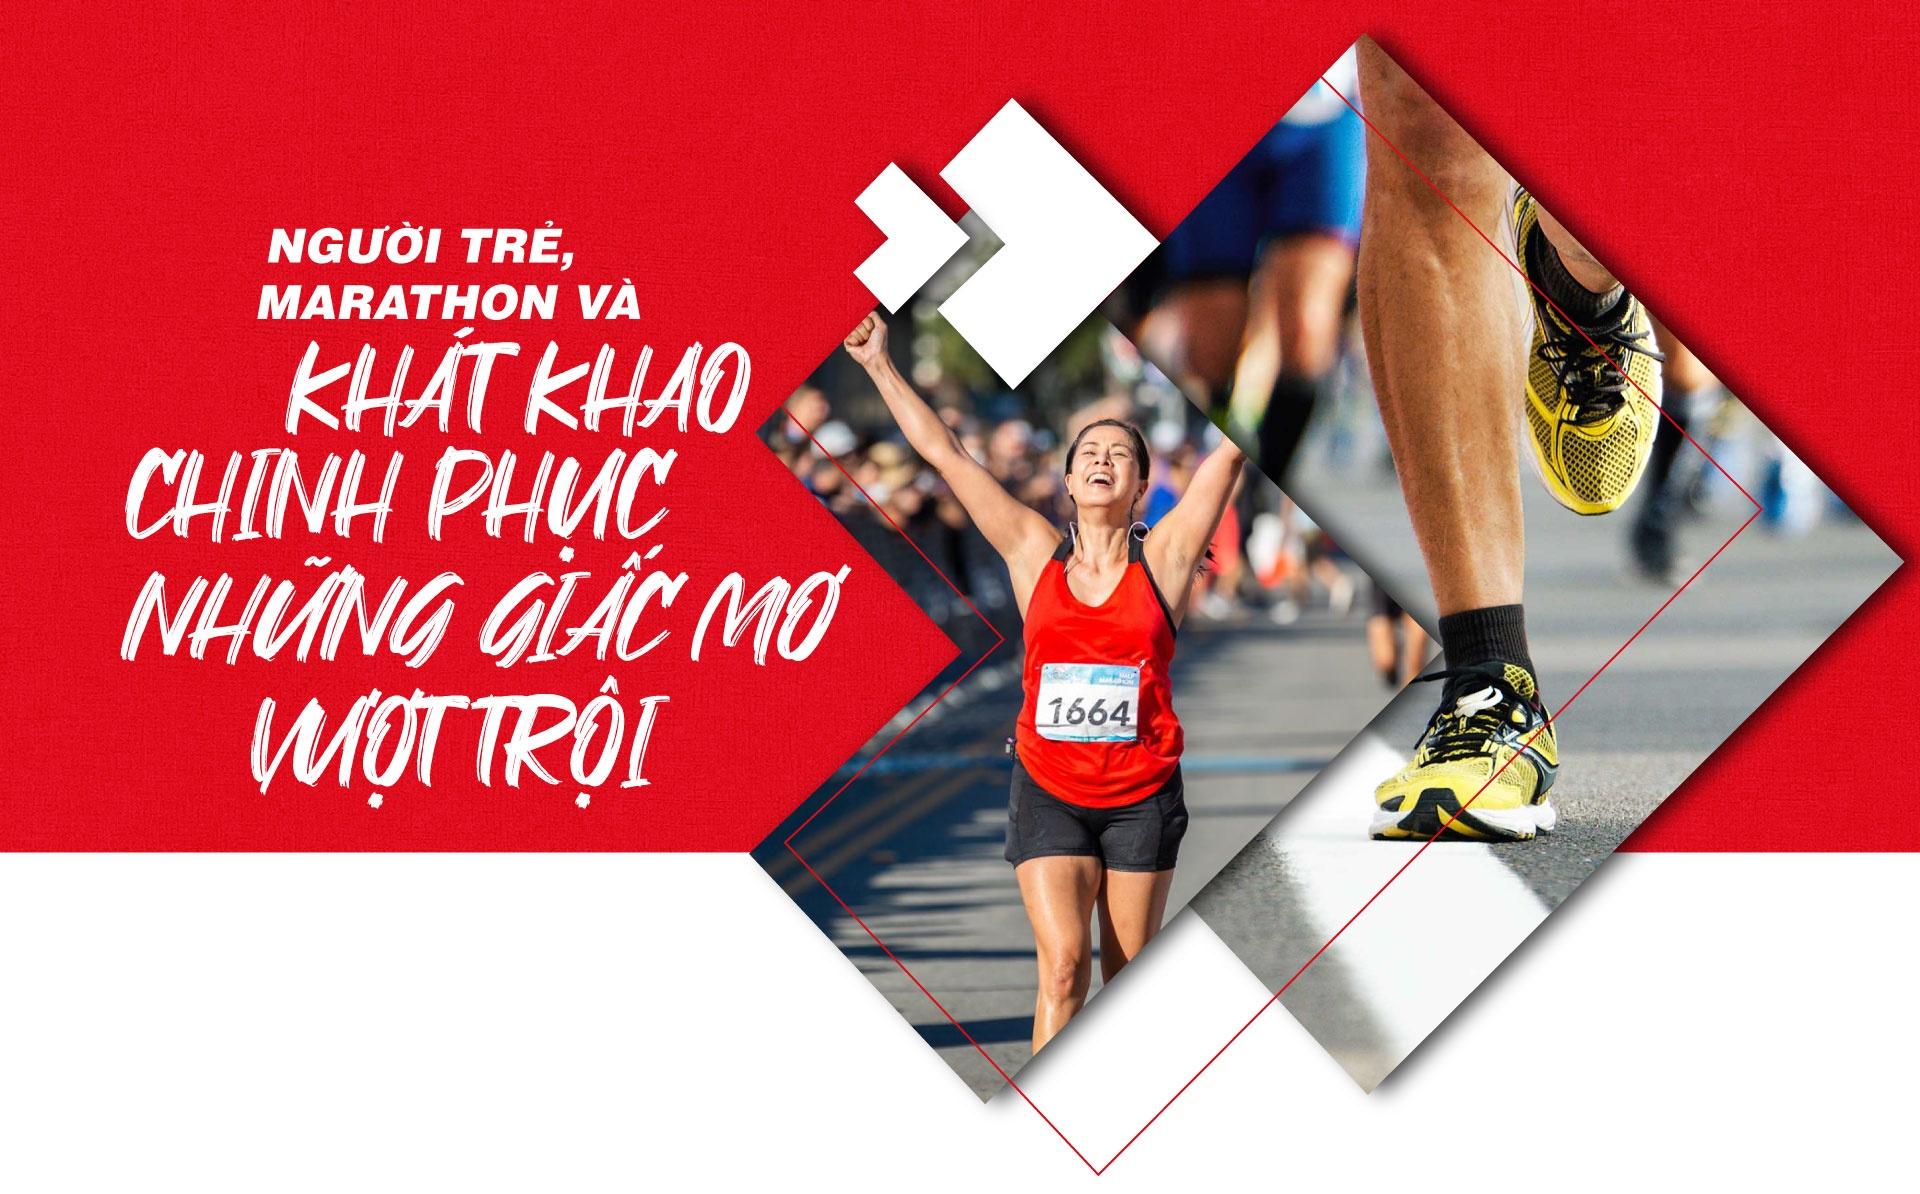 Nguoi tre, marathon va khat khao chinh phuc nhung giac mo vuot troi hinh anh 2